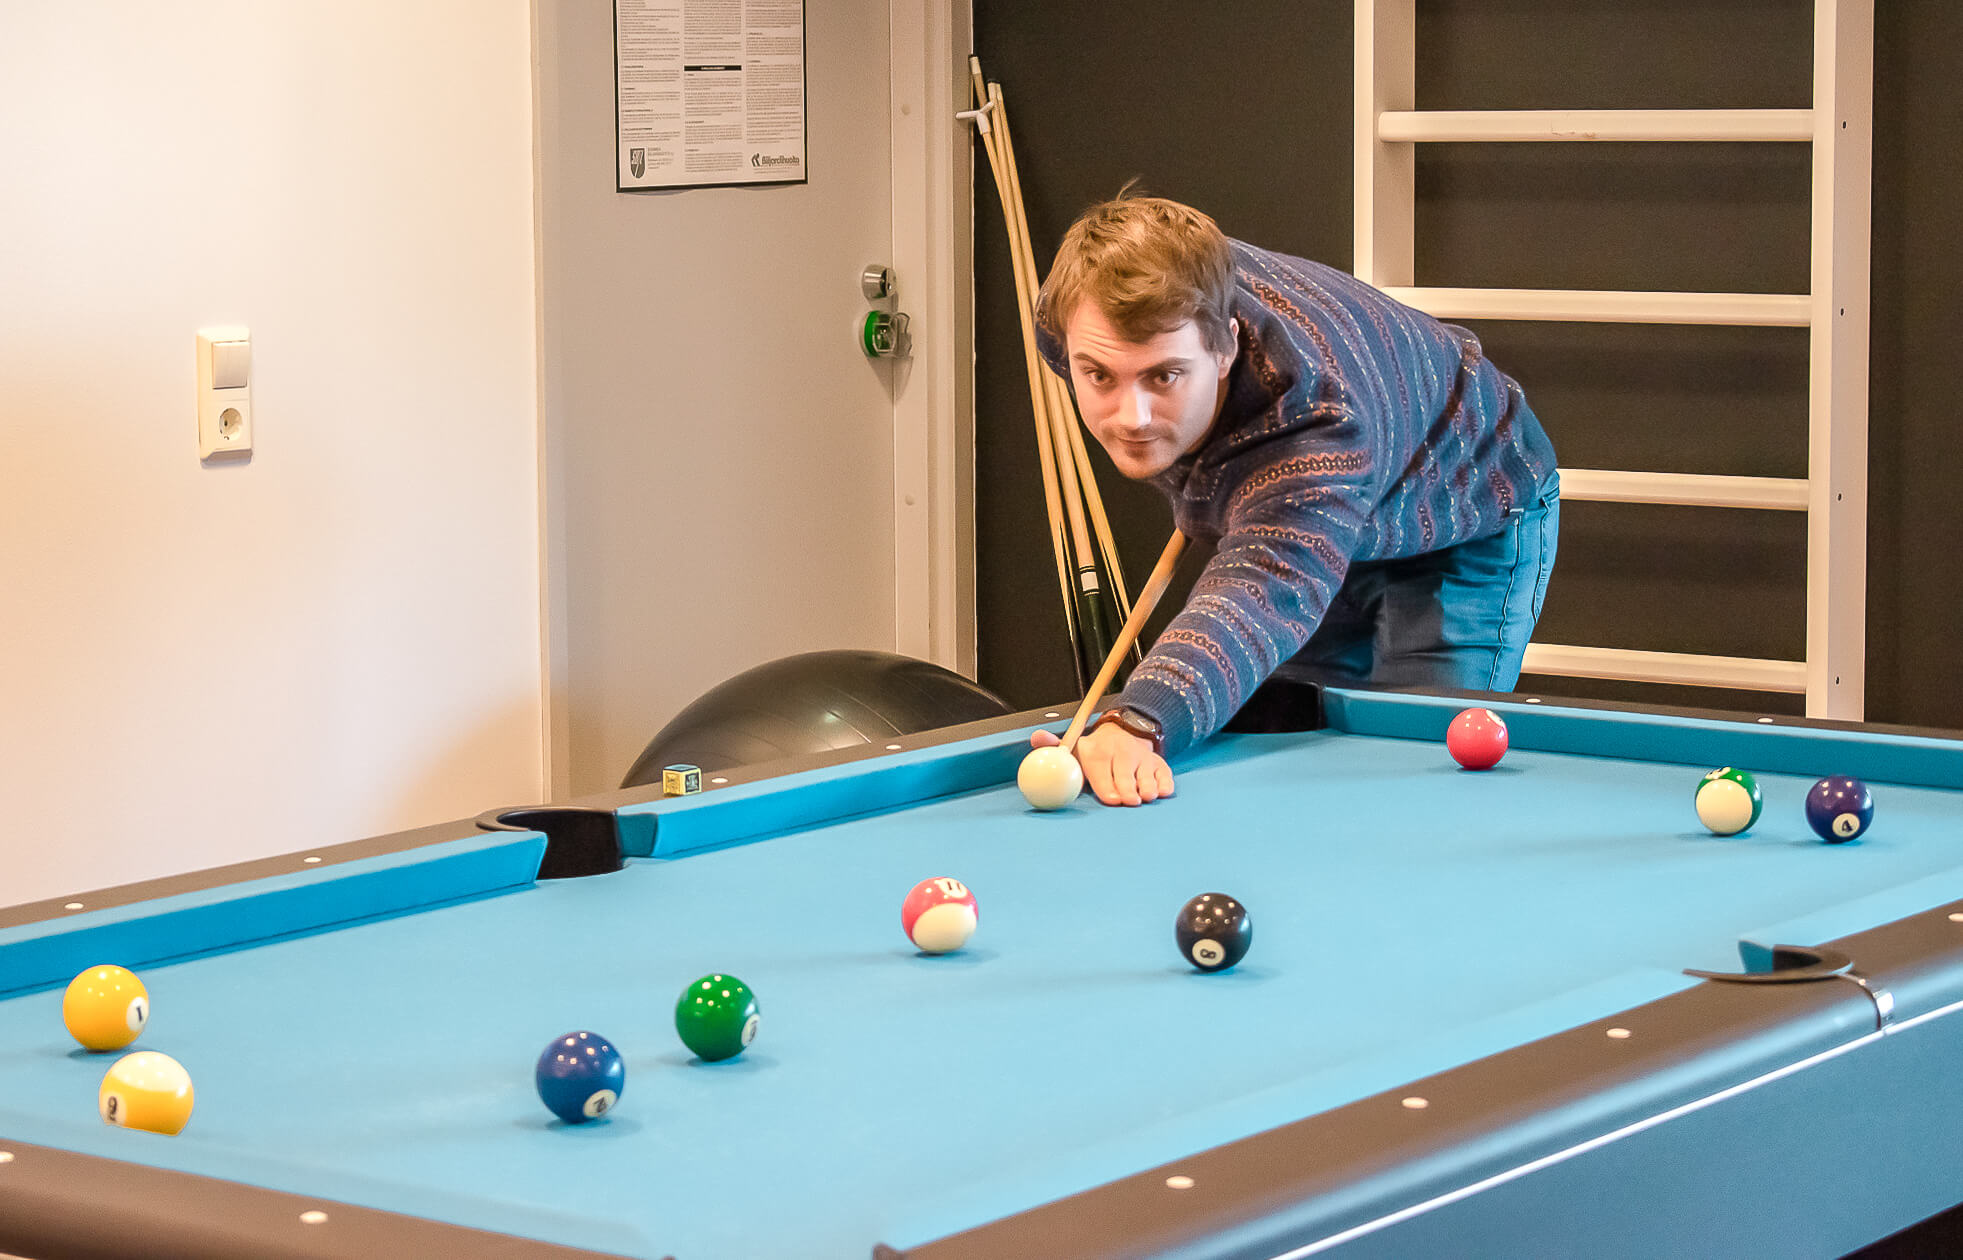 Application Engineer Joel playing pool during a break